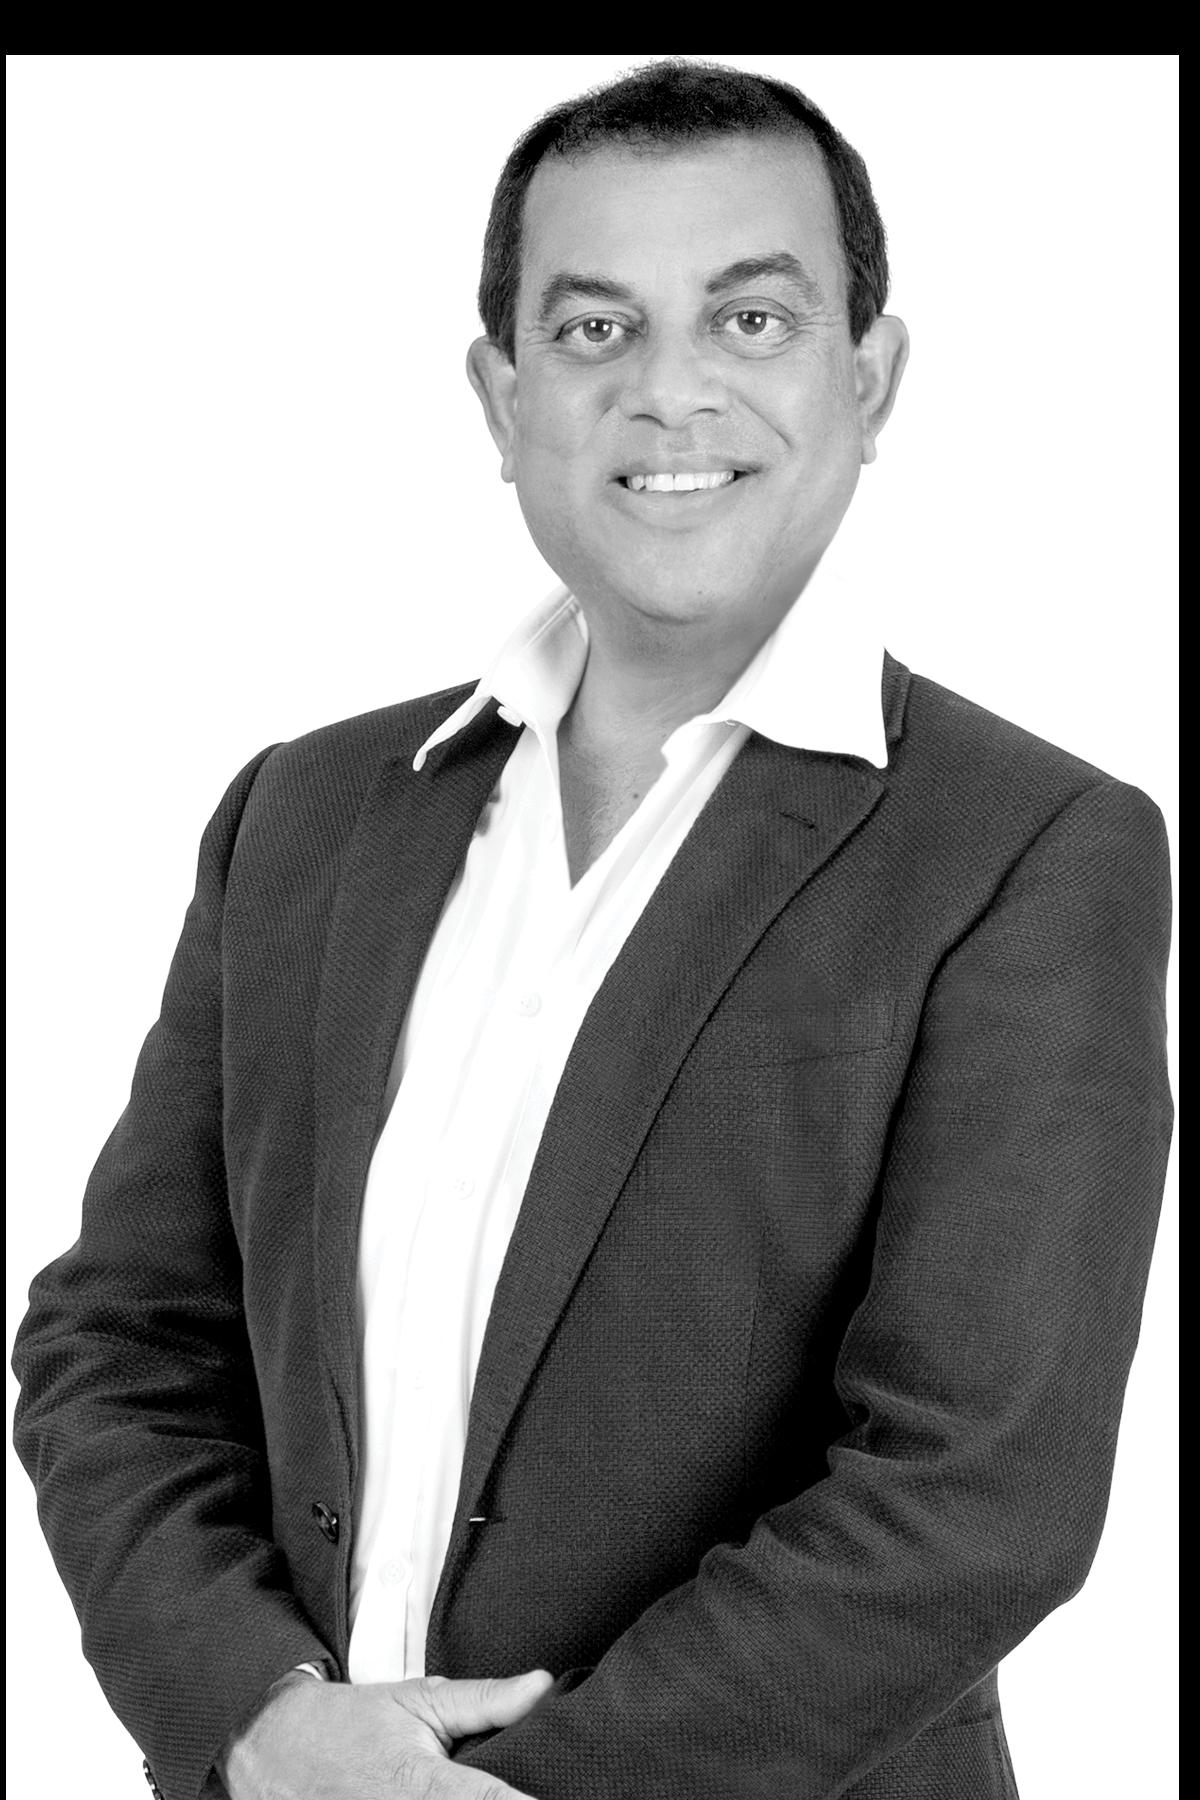 Paul Menezes